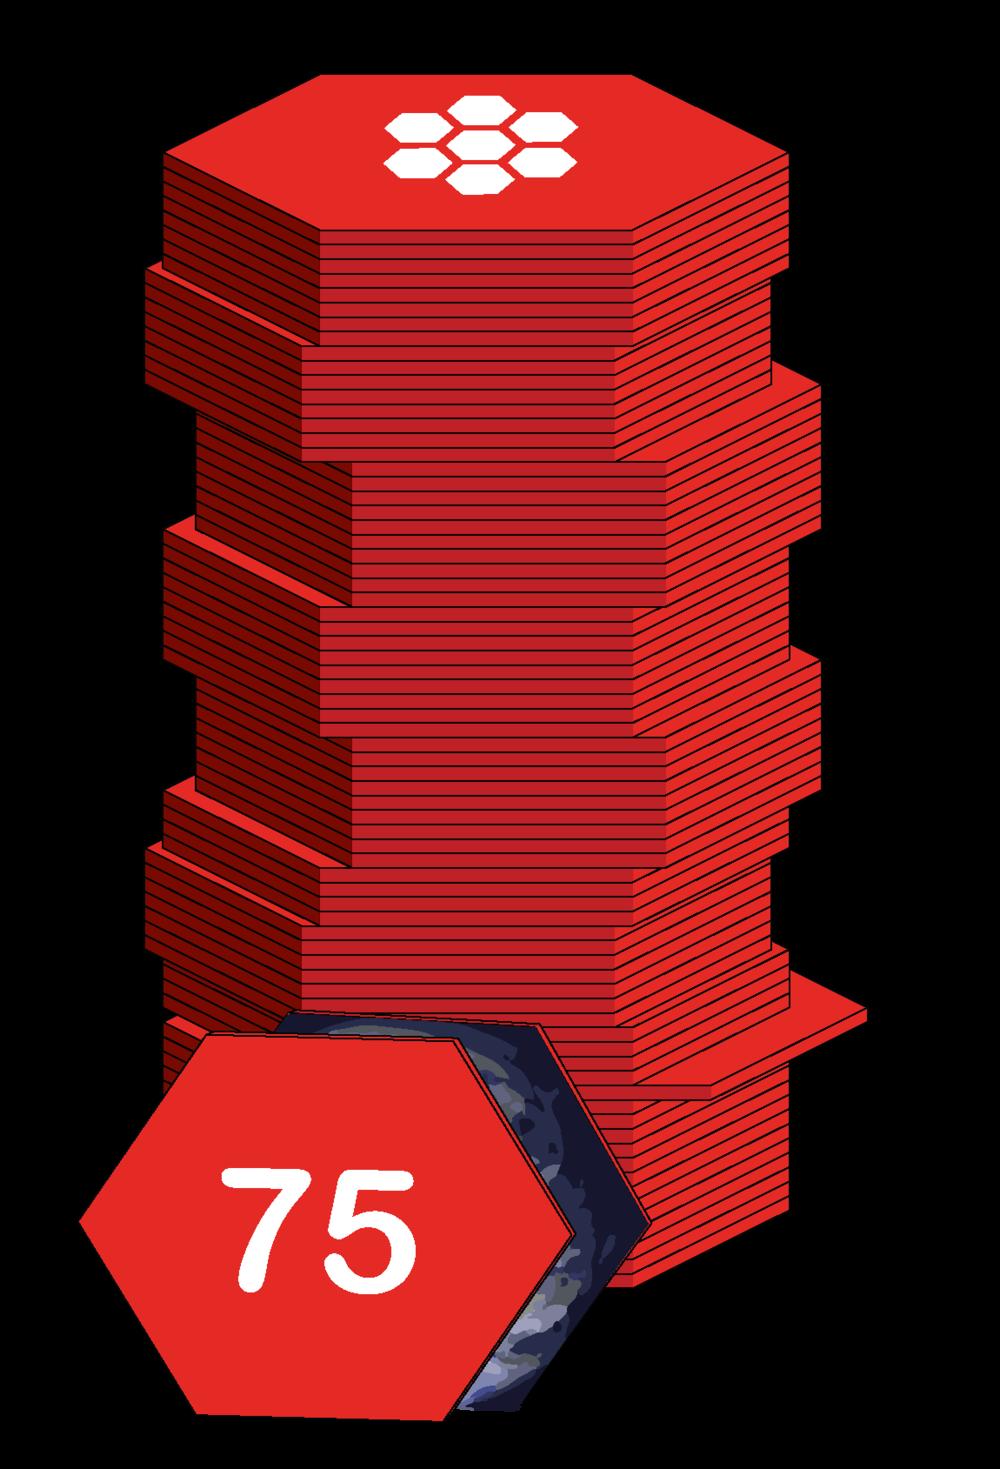 75-brainbricks